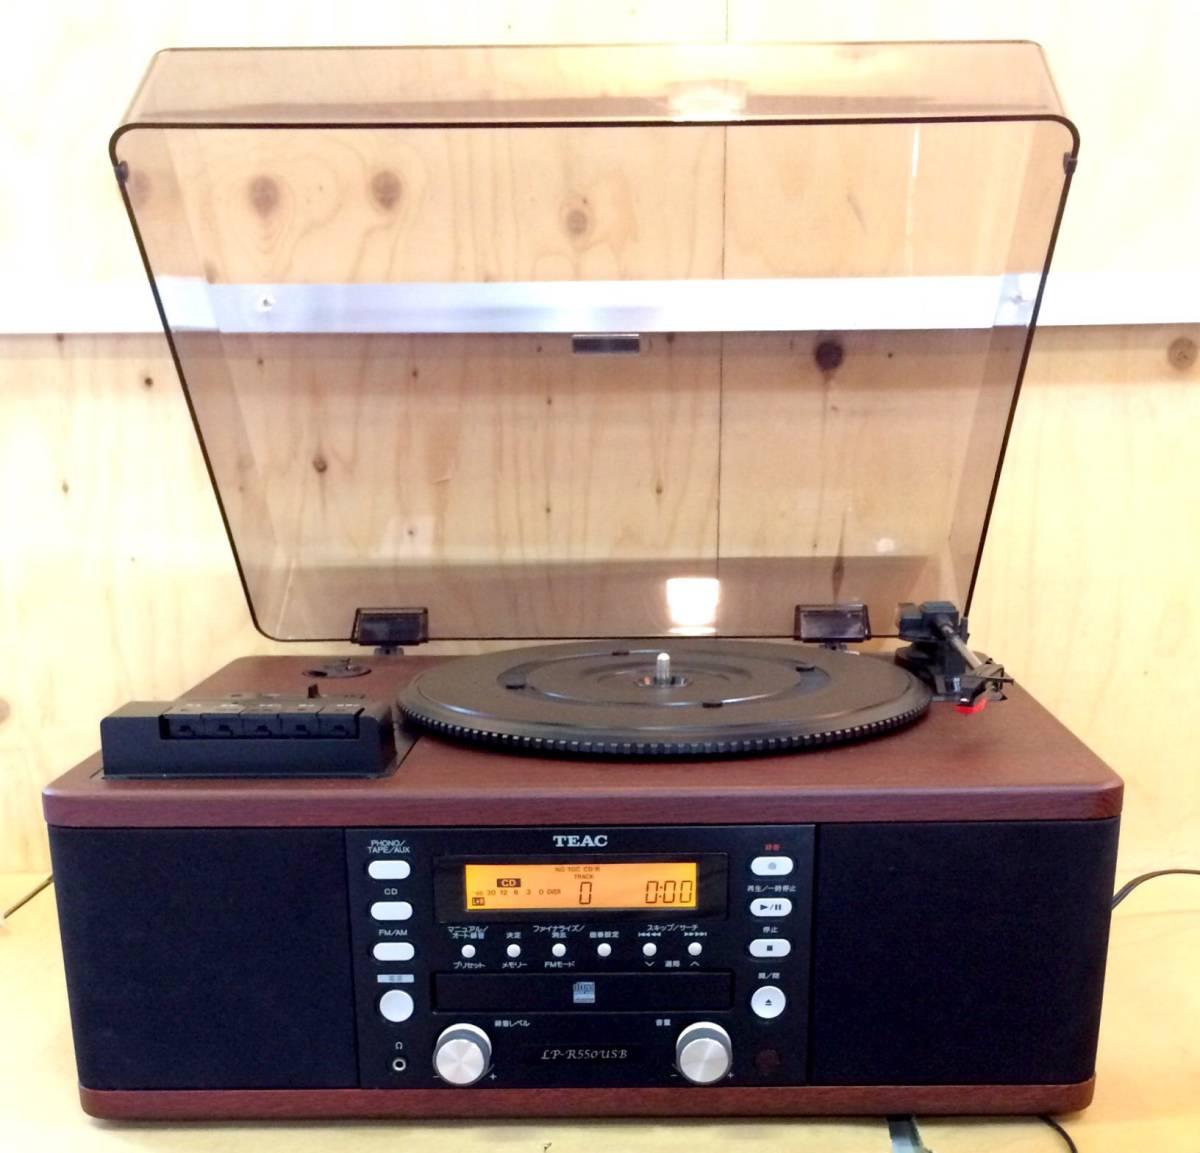 k981/TEAC LP-R550USB レコードプレーヤー ターンテーブル 2014年製